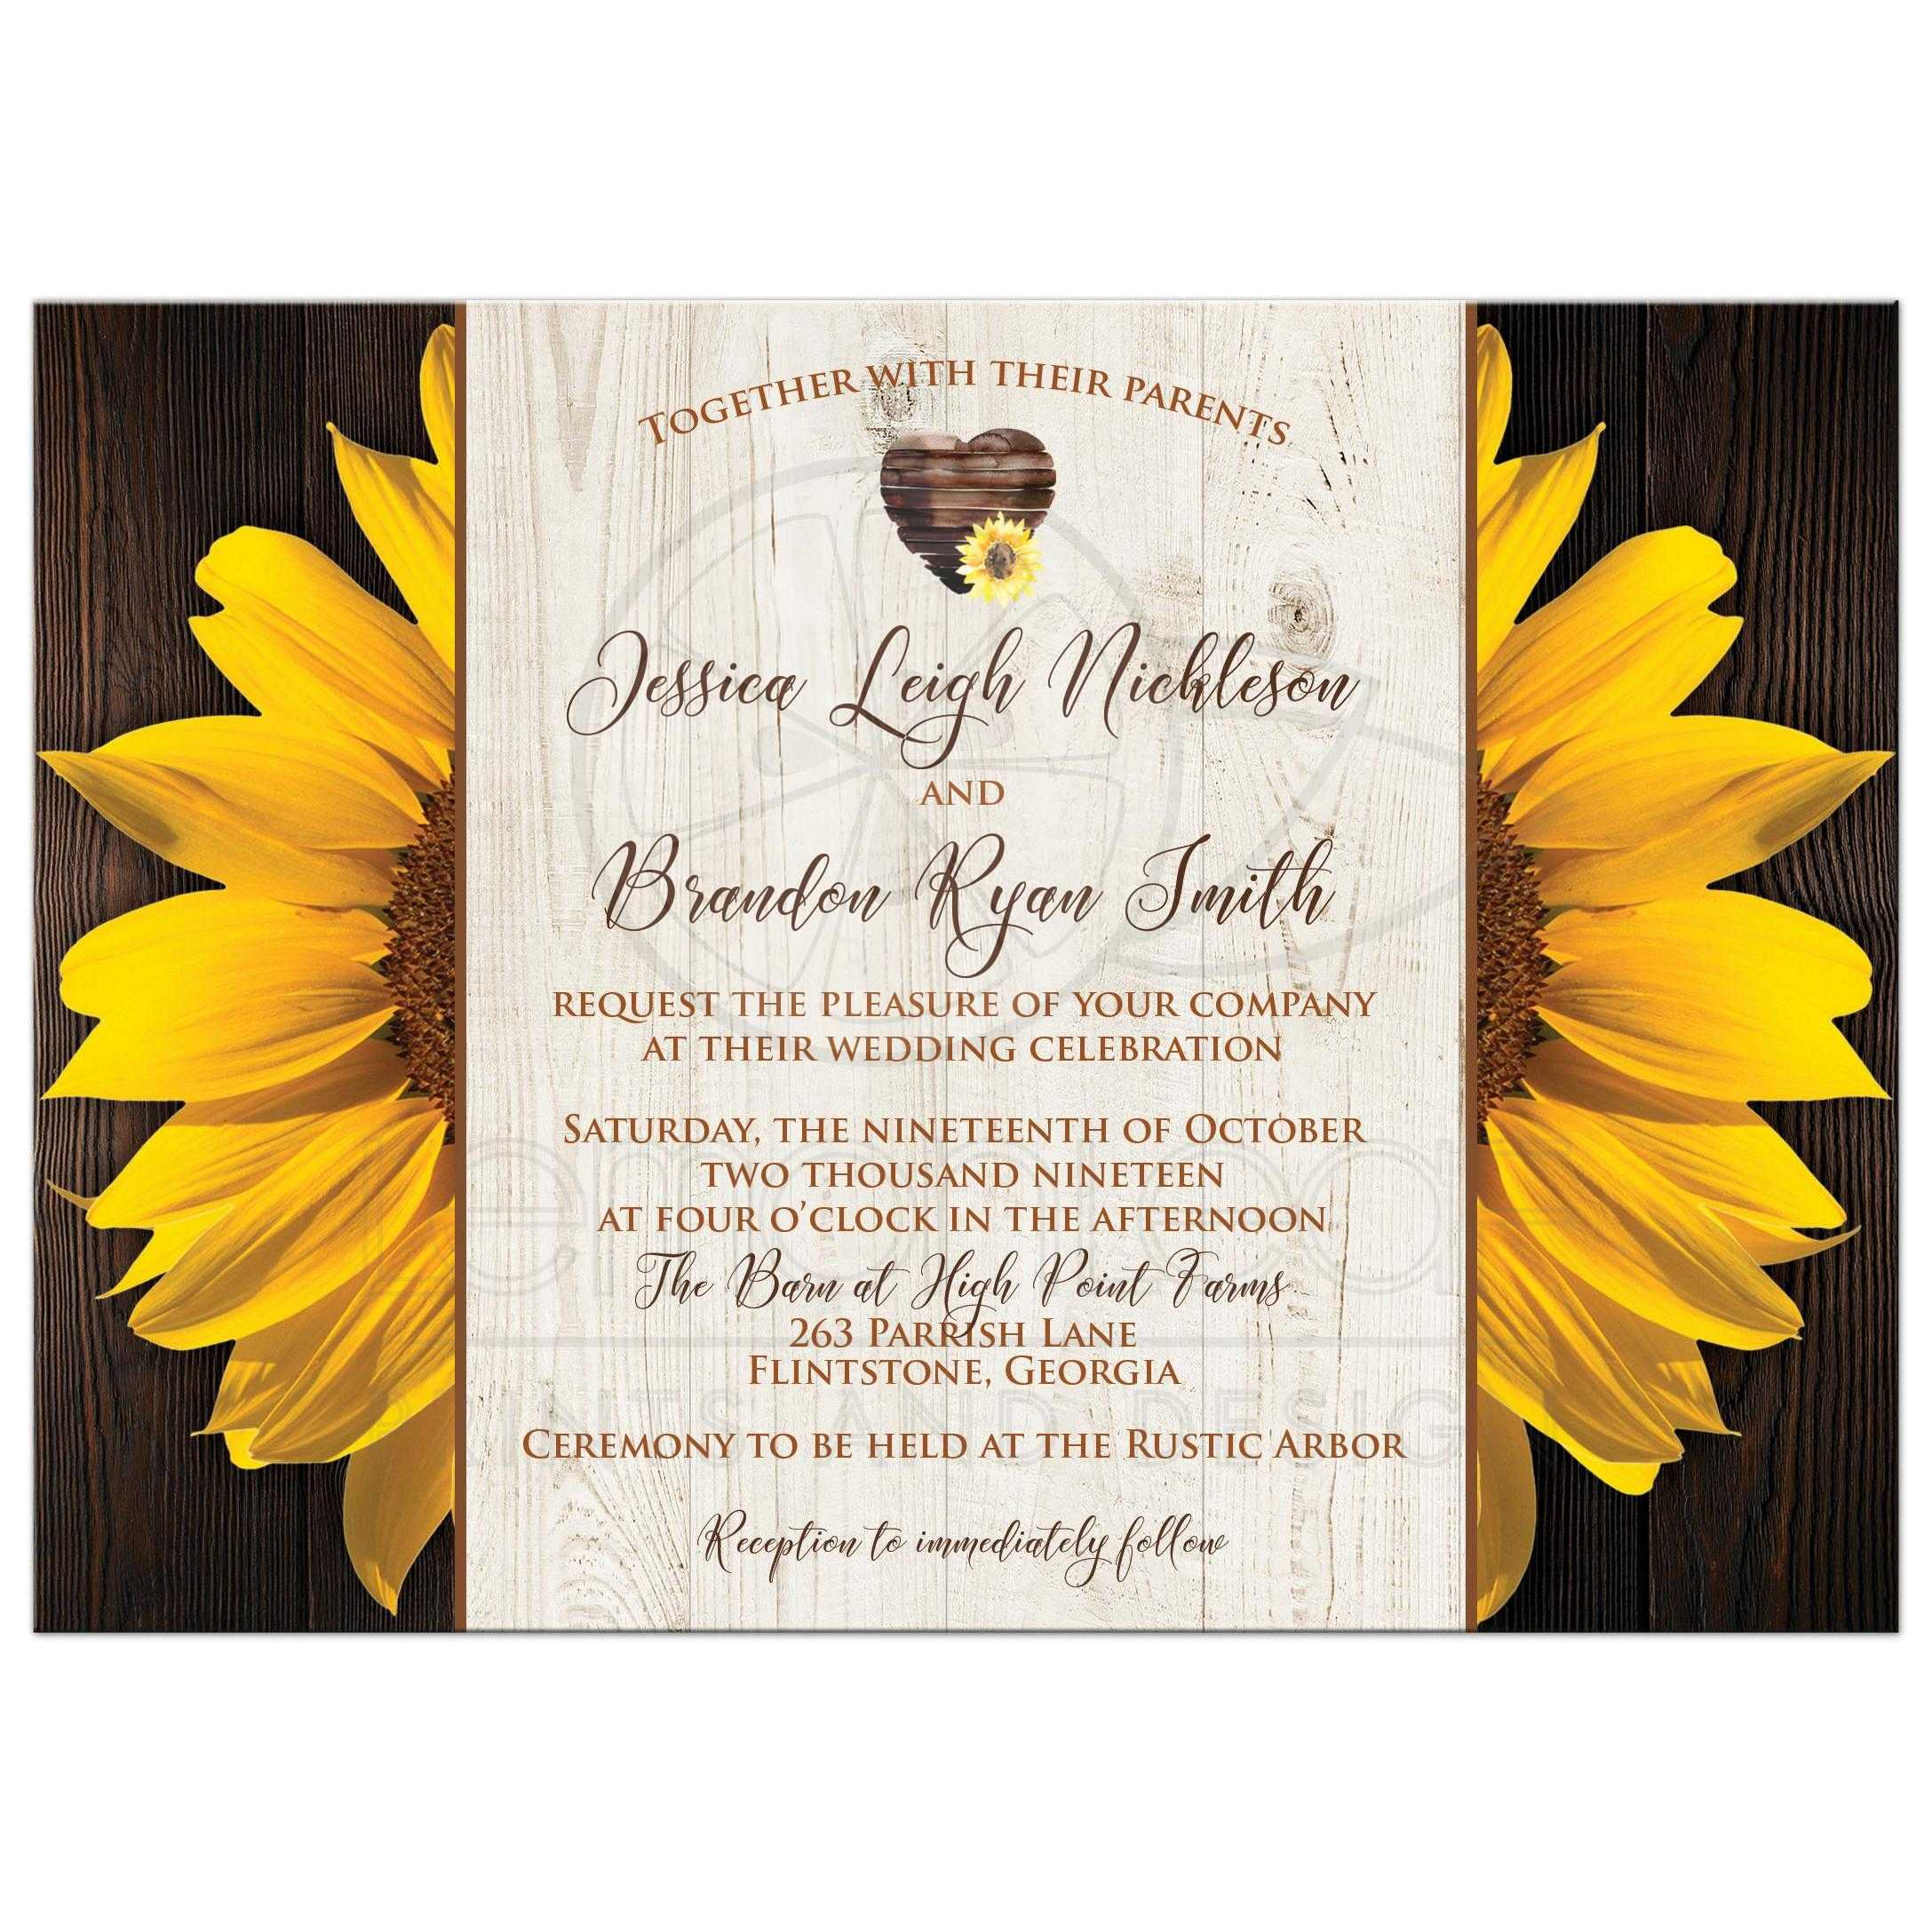 Sunflowers on Wood Grain Wedding Invitation with Heart